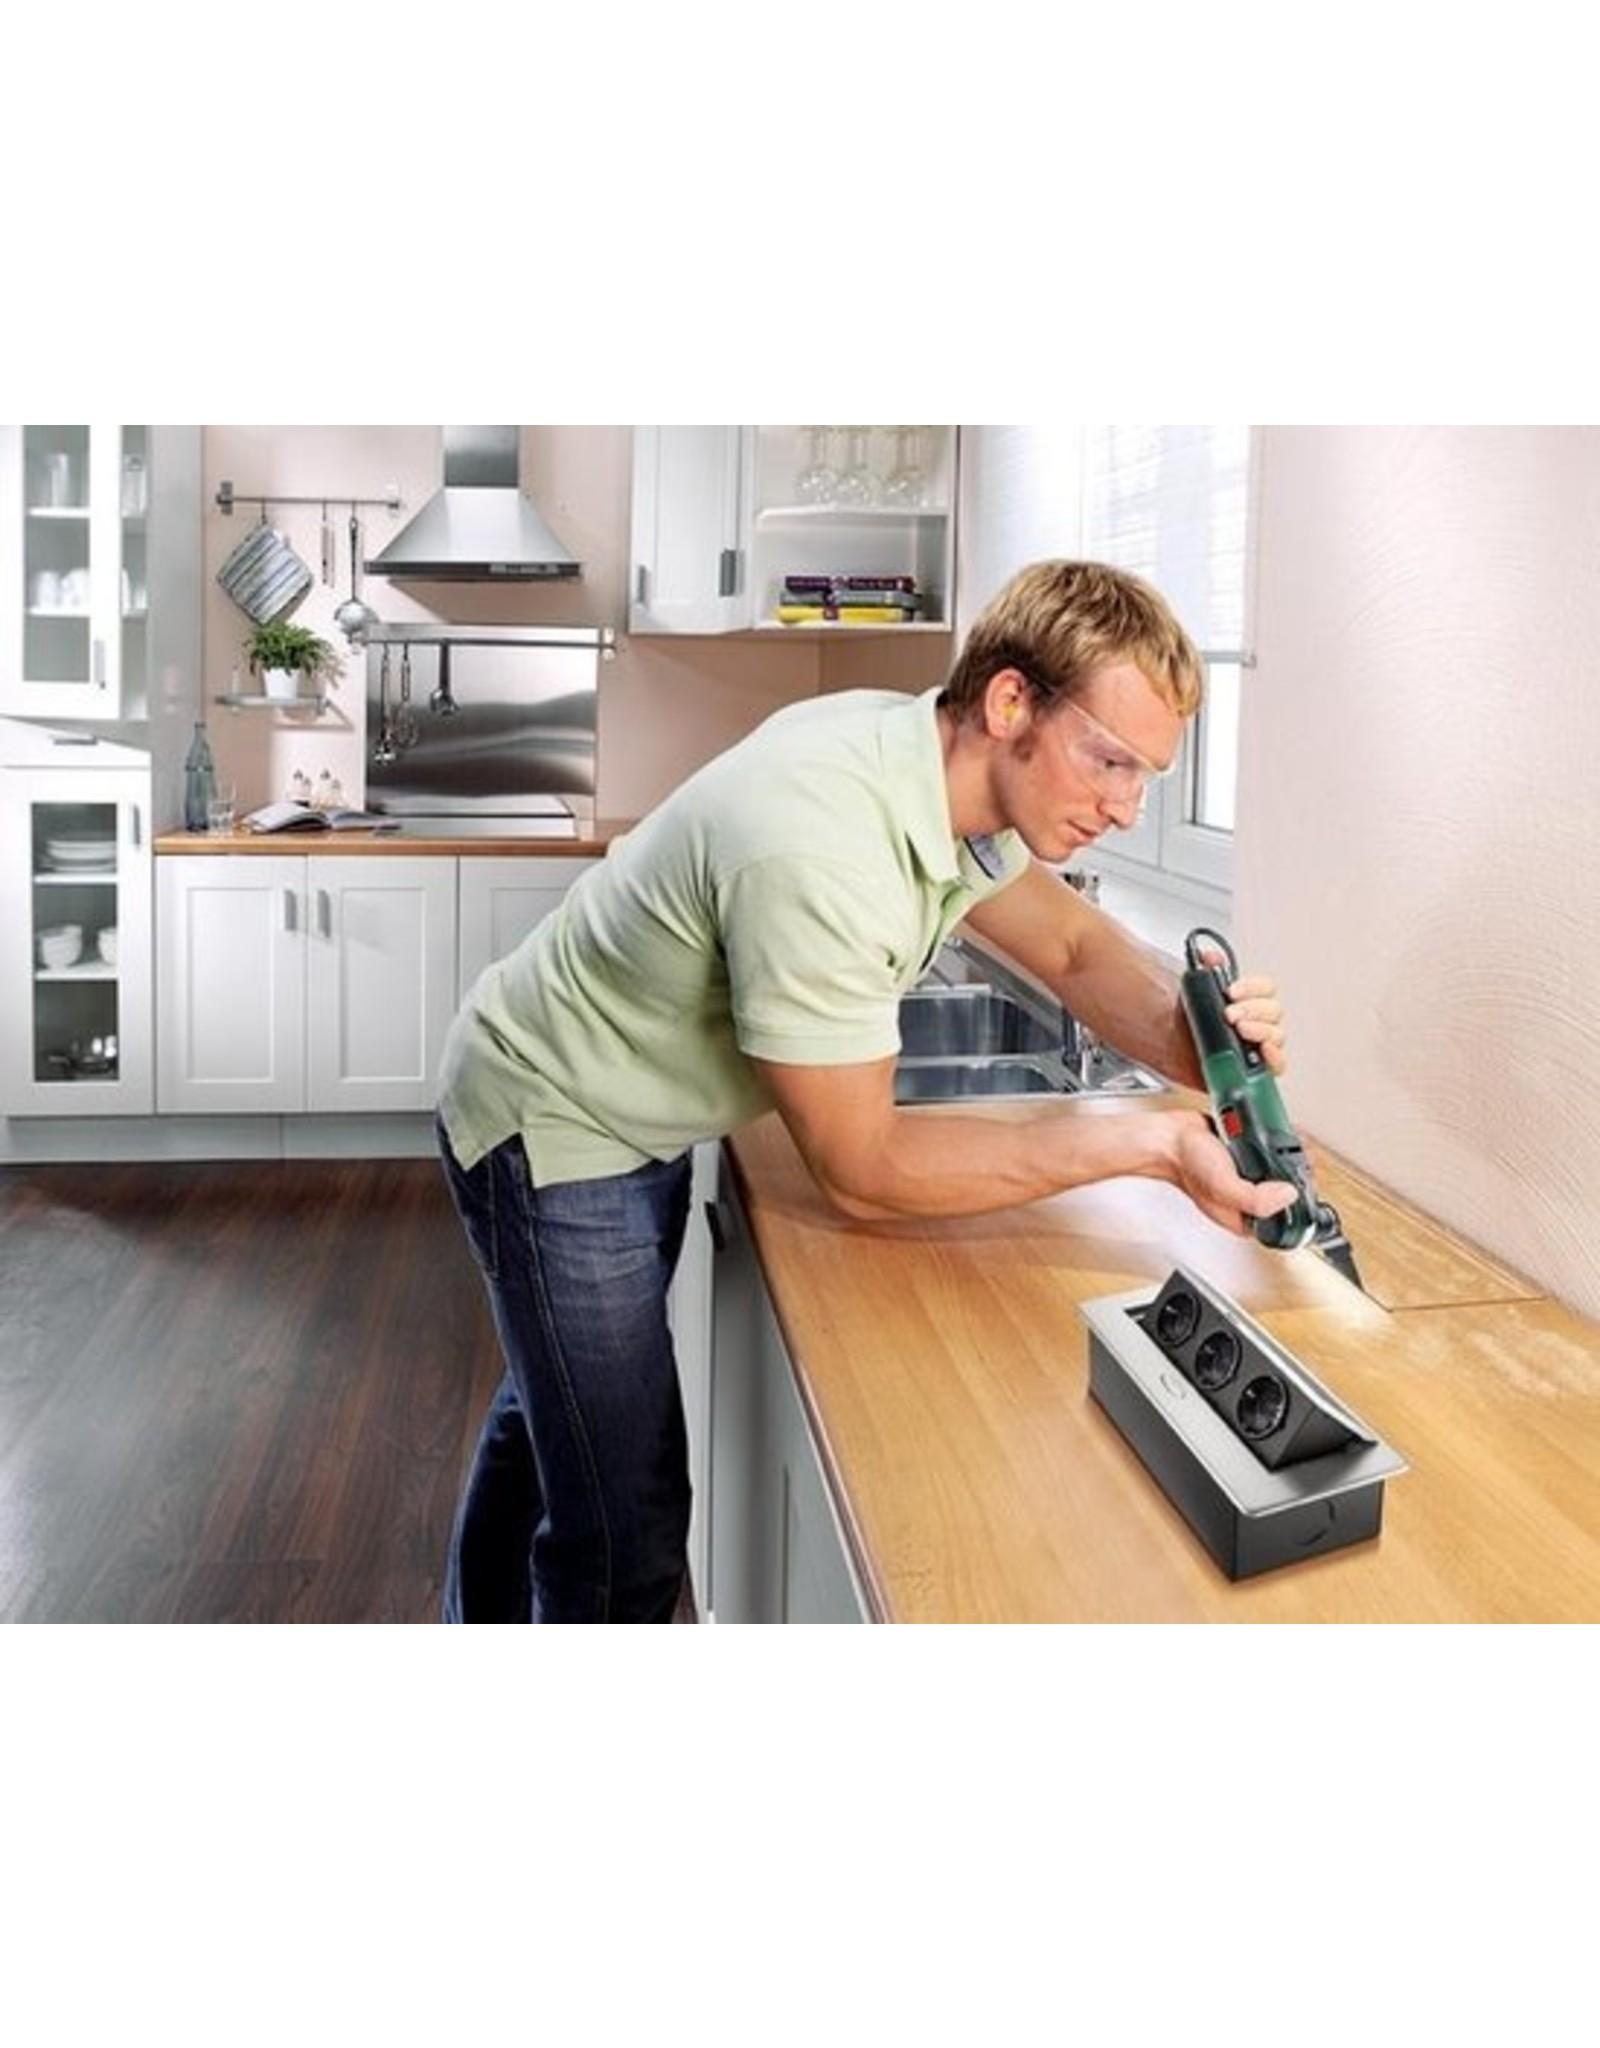 Bosch Professional Bosch PMF 350 CES Multitool - Oscillerend - 350 Watt - Inclusief 8 accessoires en kunststof koffer